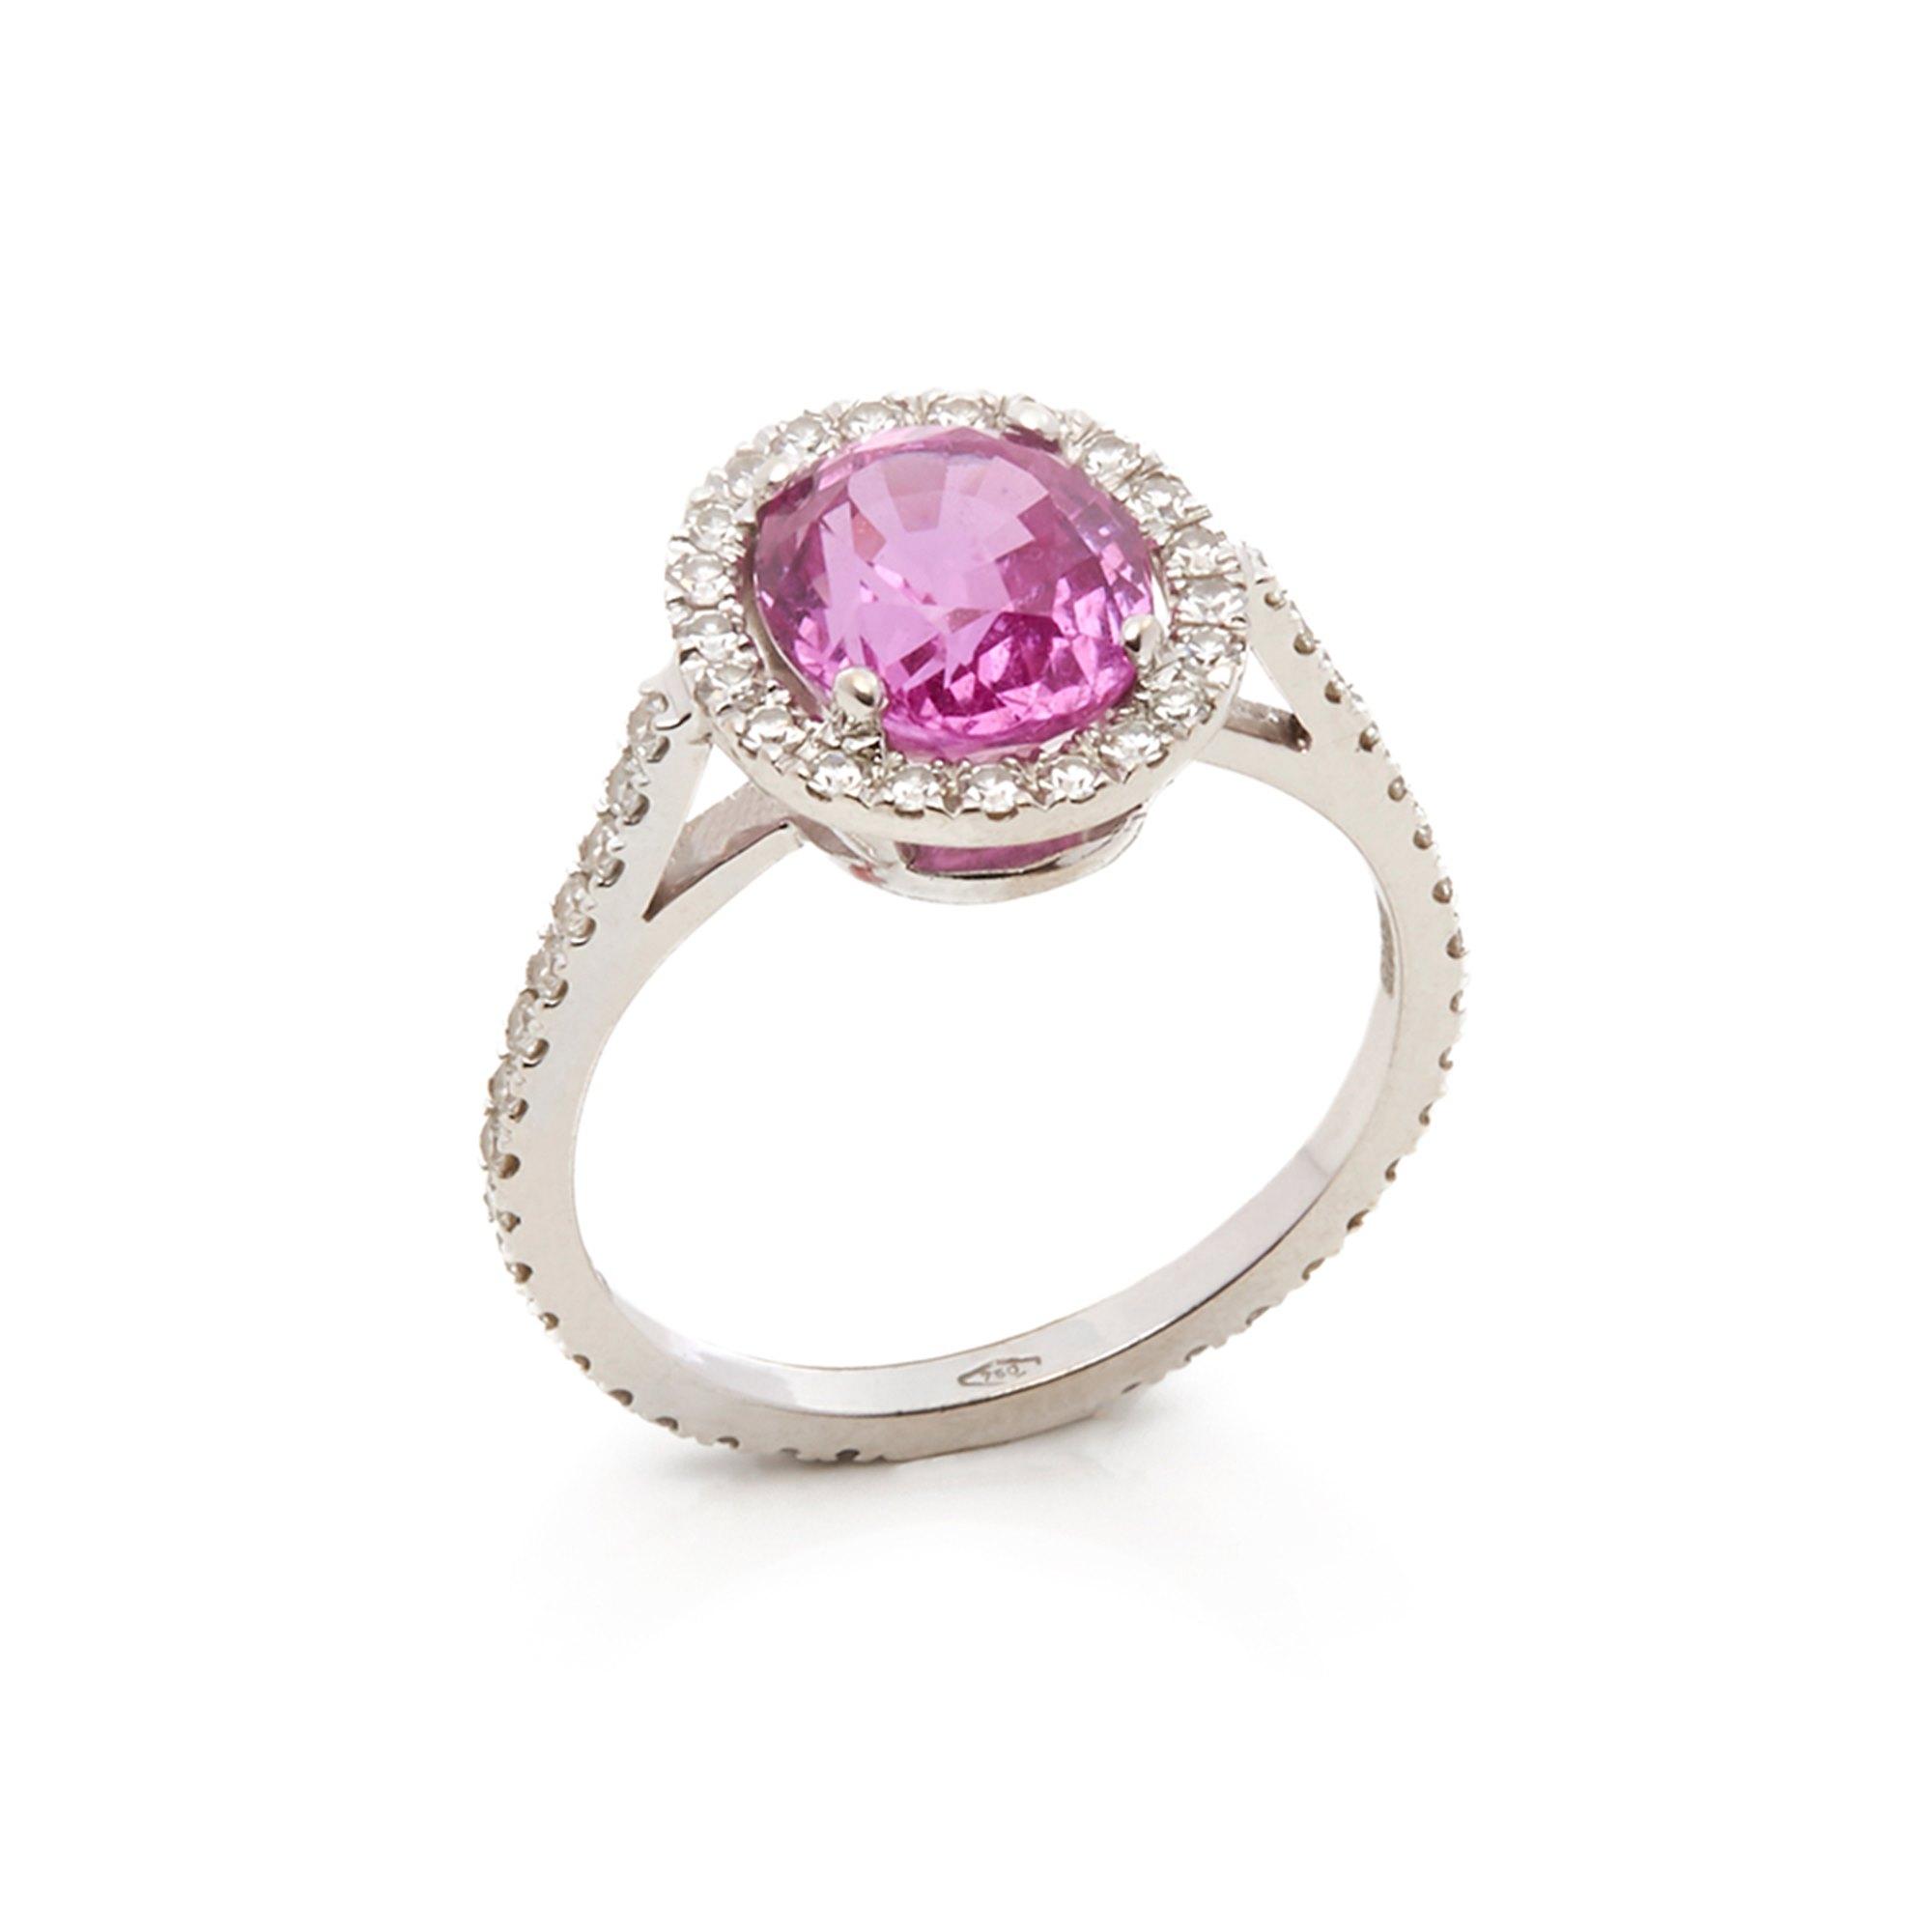 David Morris 18k White Gold Pink Sapphire & Diamond Cocktail Ring